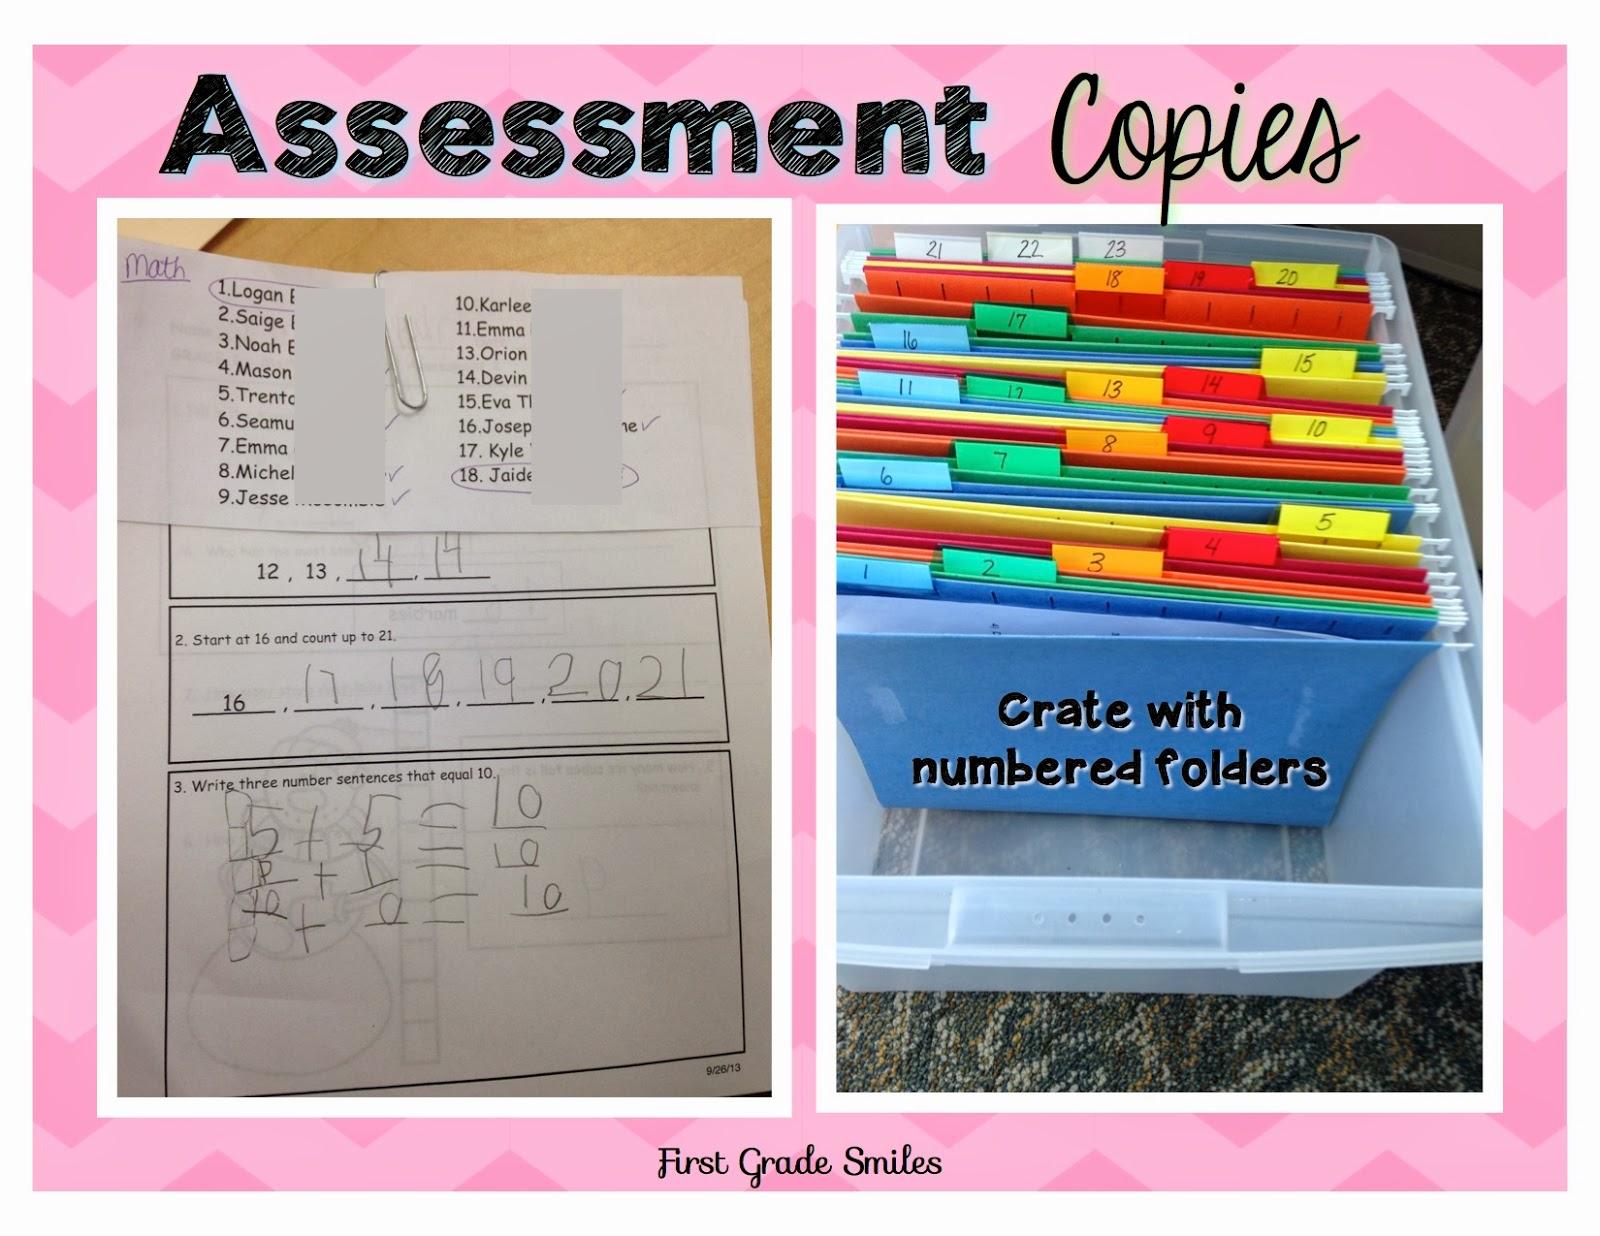 Classroom Organization Ideas First Grade ~ Organizing student data